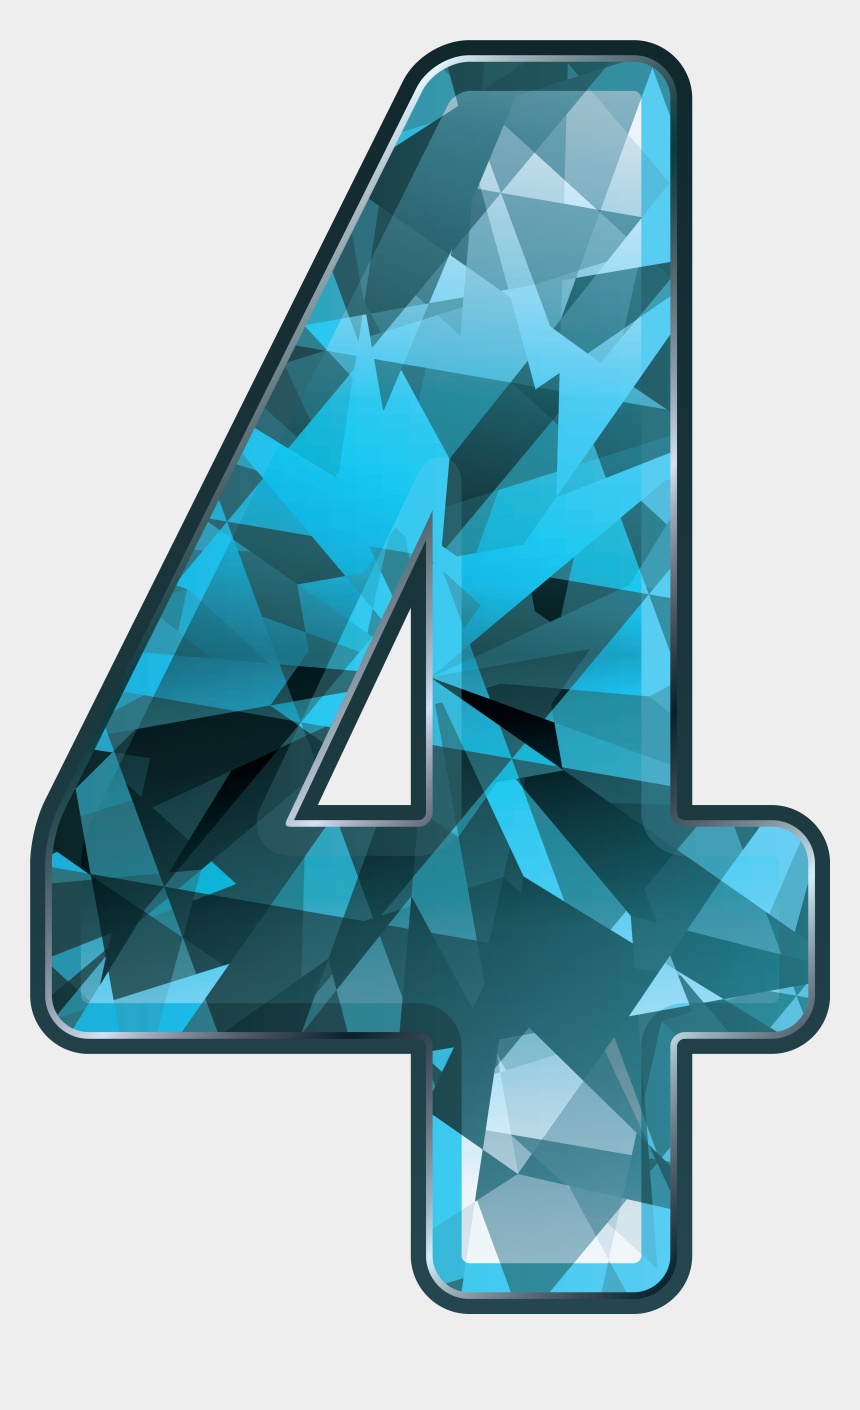 crystal clipart, Cartoons - Blue Crystal Number Four Png Clipart Image - Blue Crystal Numbers Png